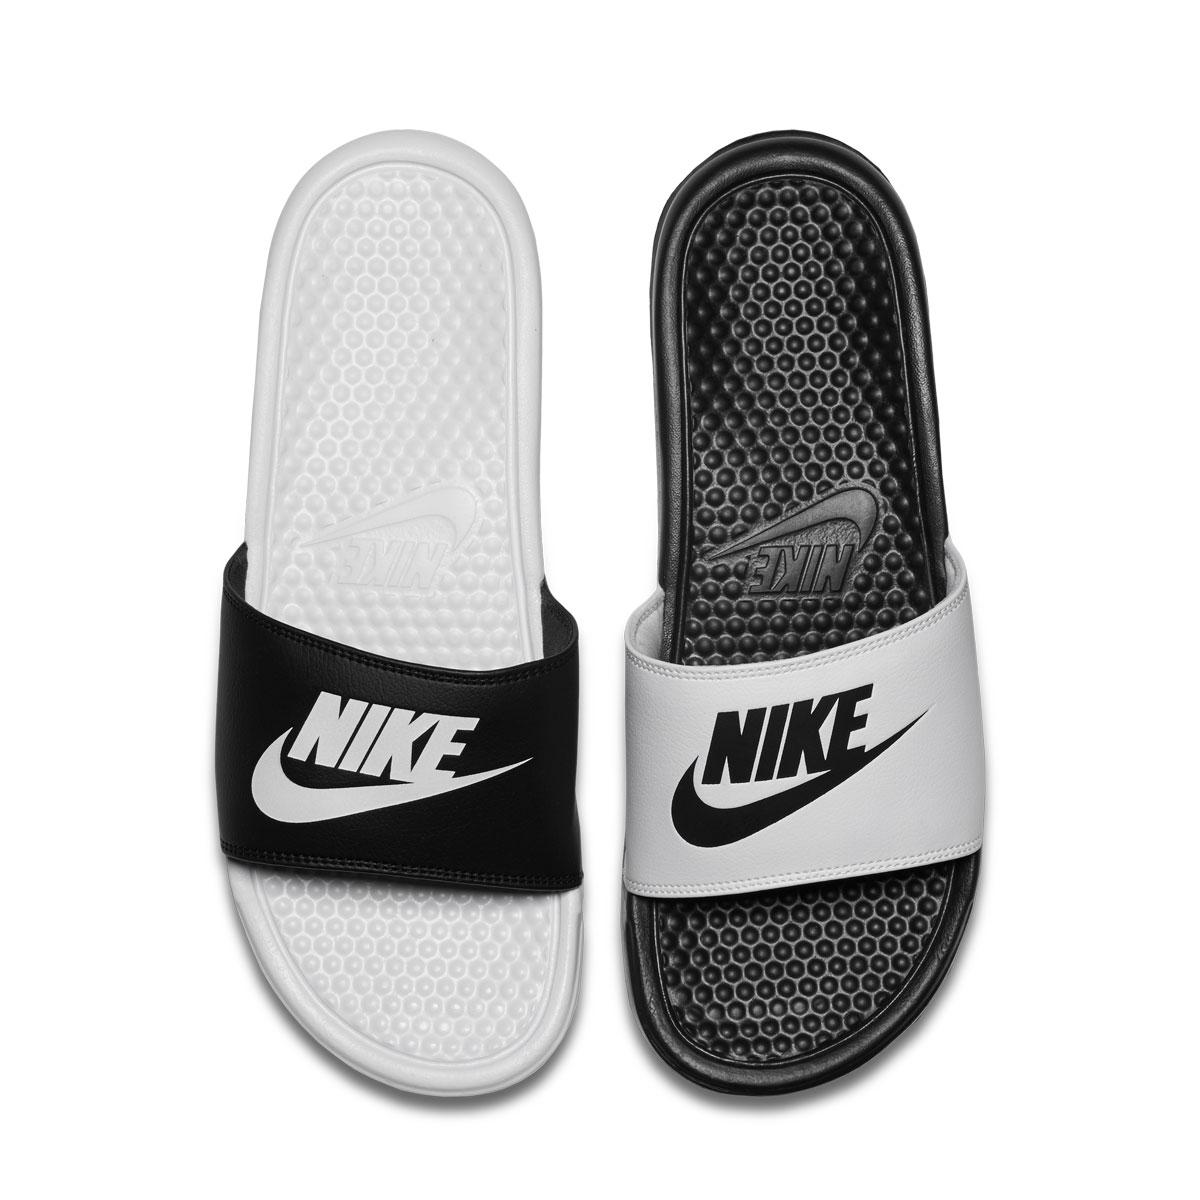 the best attitude f4628 f85a1 NIKE BENASUI JDI MISMATCH (Nike Benassi JDI mismatch) BLACK WHITE 16SU-I